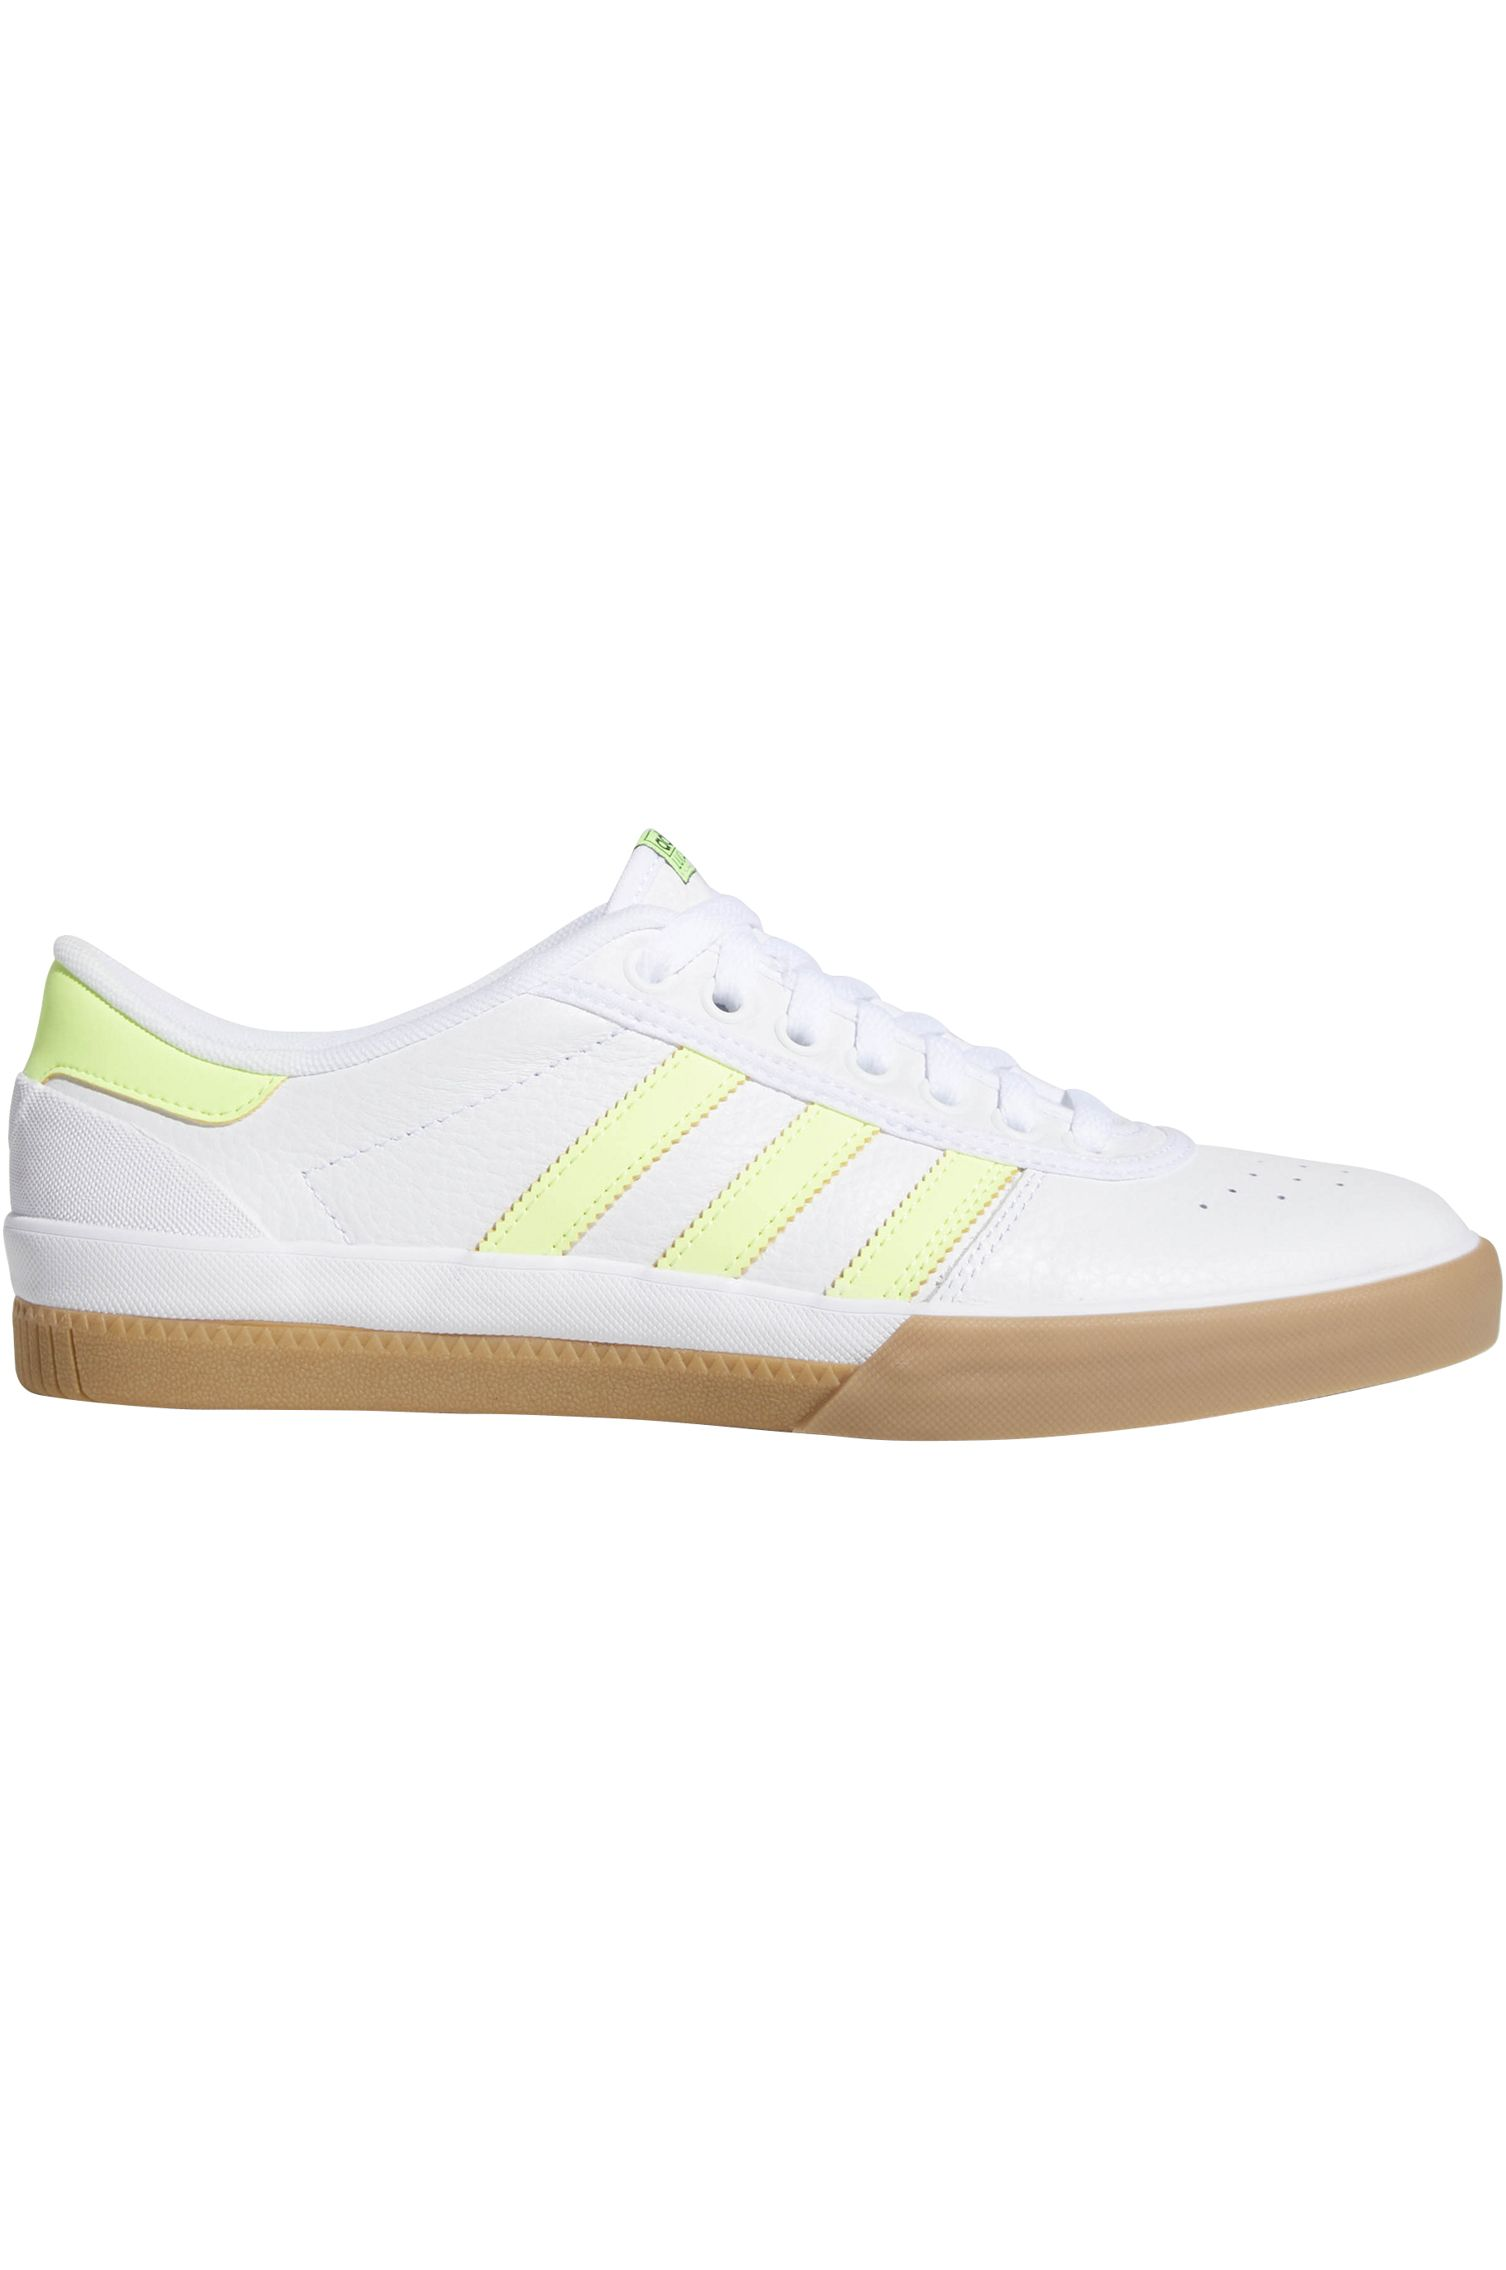 Tenis Adidas LUCAS PREMIERE Ftwr White/Hi-Res Yellow/Gum4